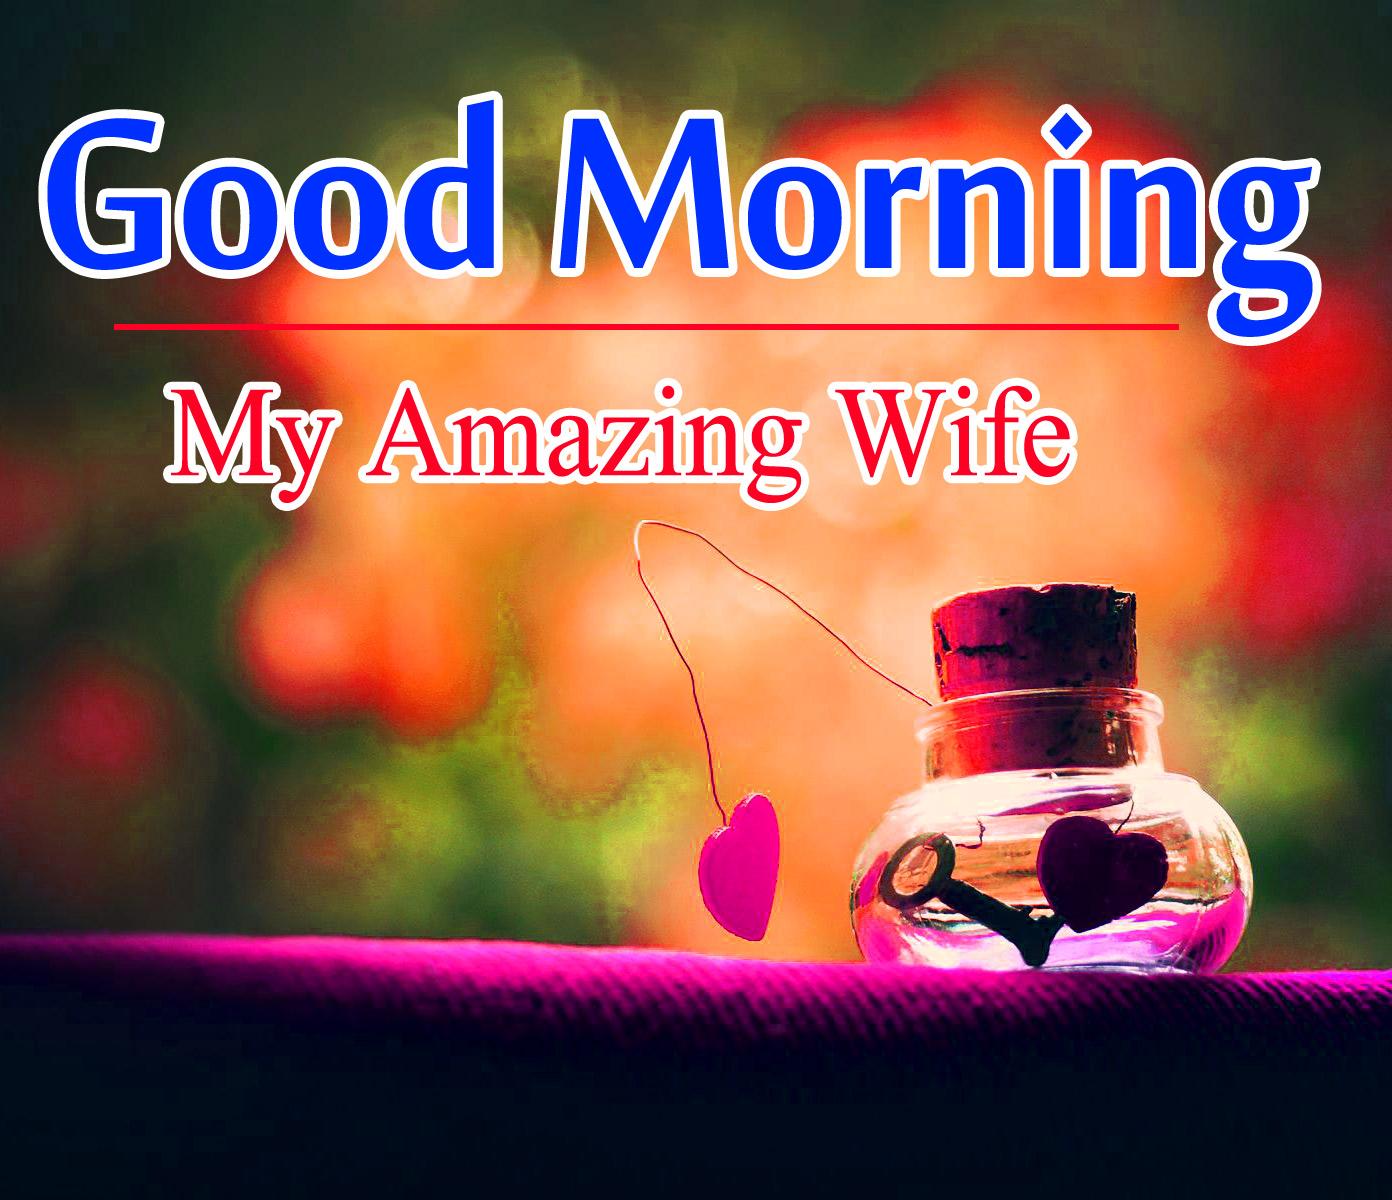 good morning Wallpaper for Wife 9